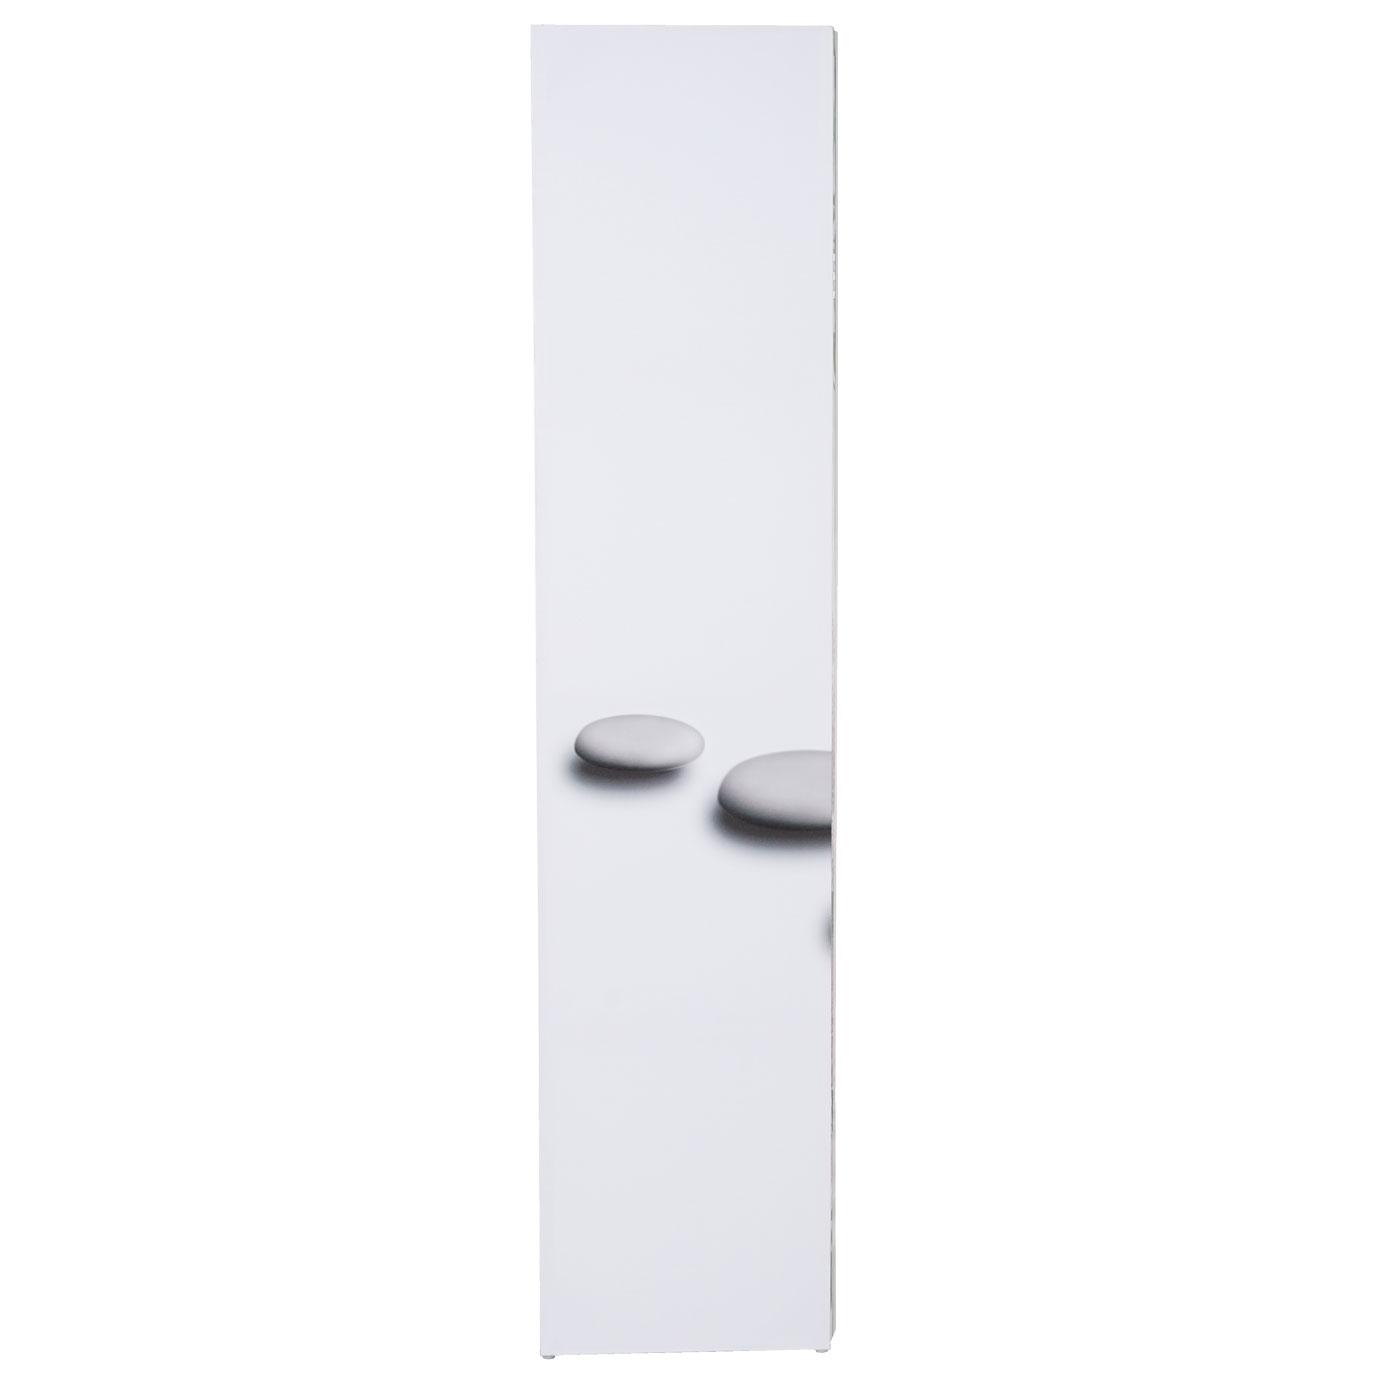 Paravent Raumteiler Motiv Kho Samui 180x120cm zusammengeklappt